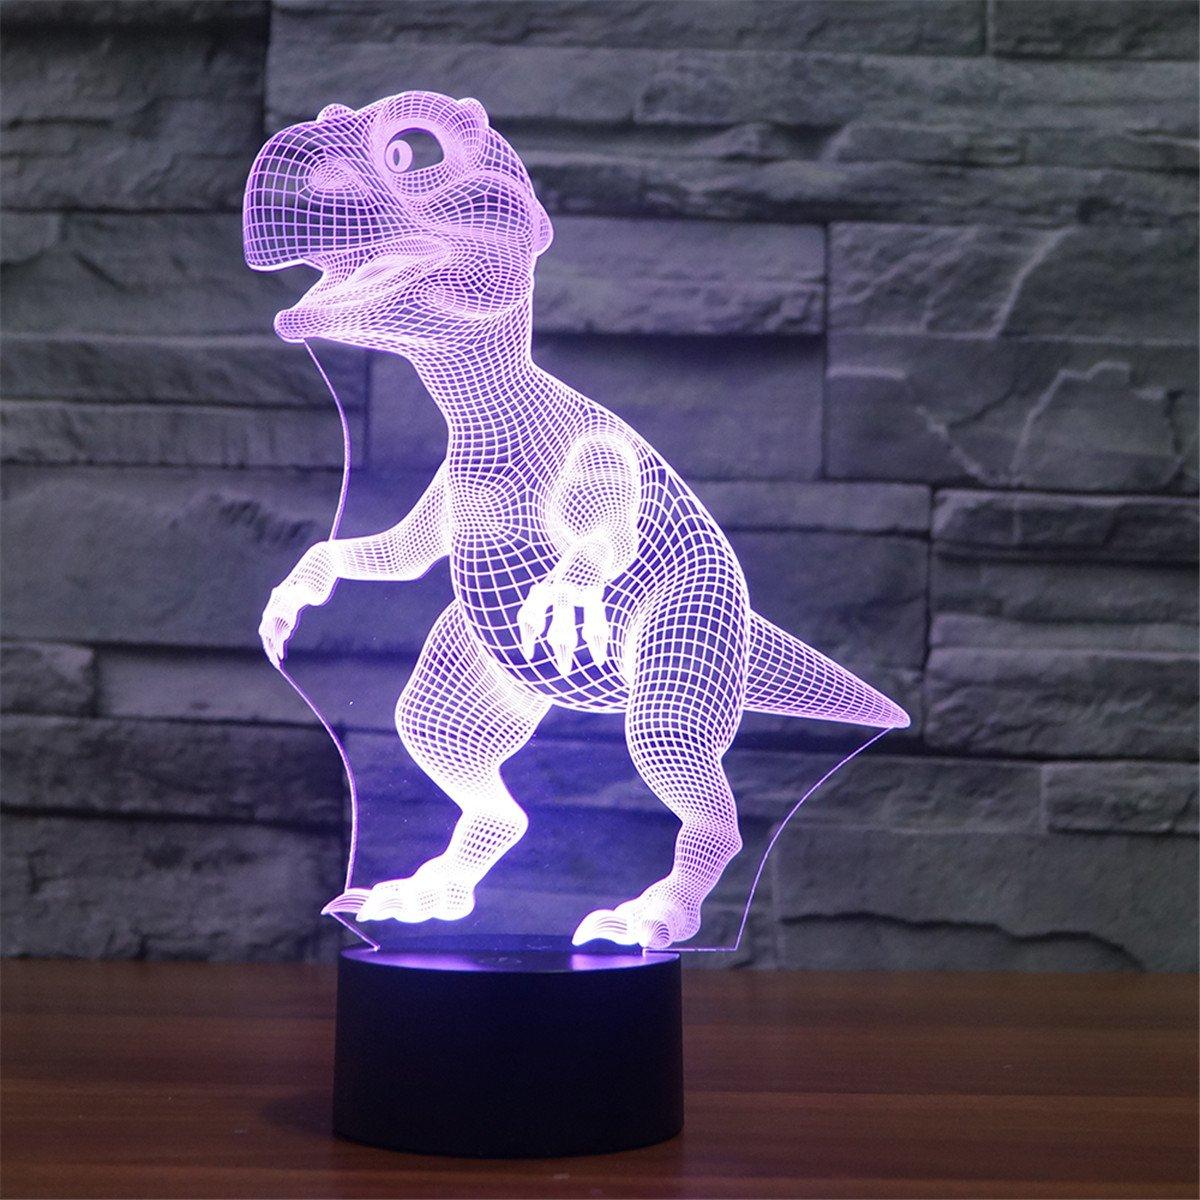 Fantastisch T Rex Dinosaurier Färbung Seite Fotos - Framing ...